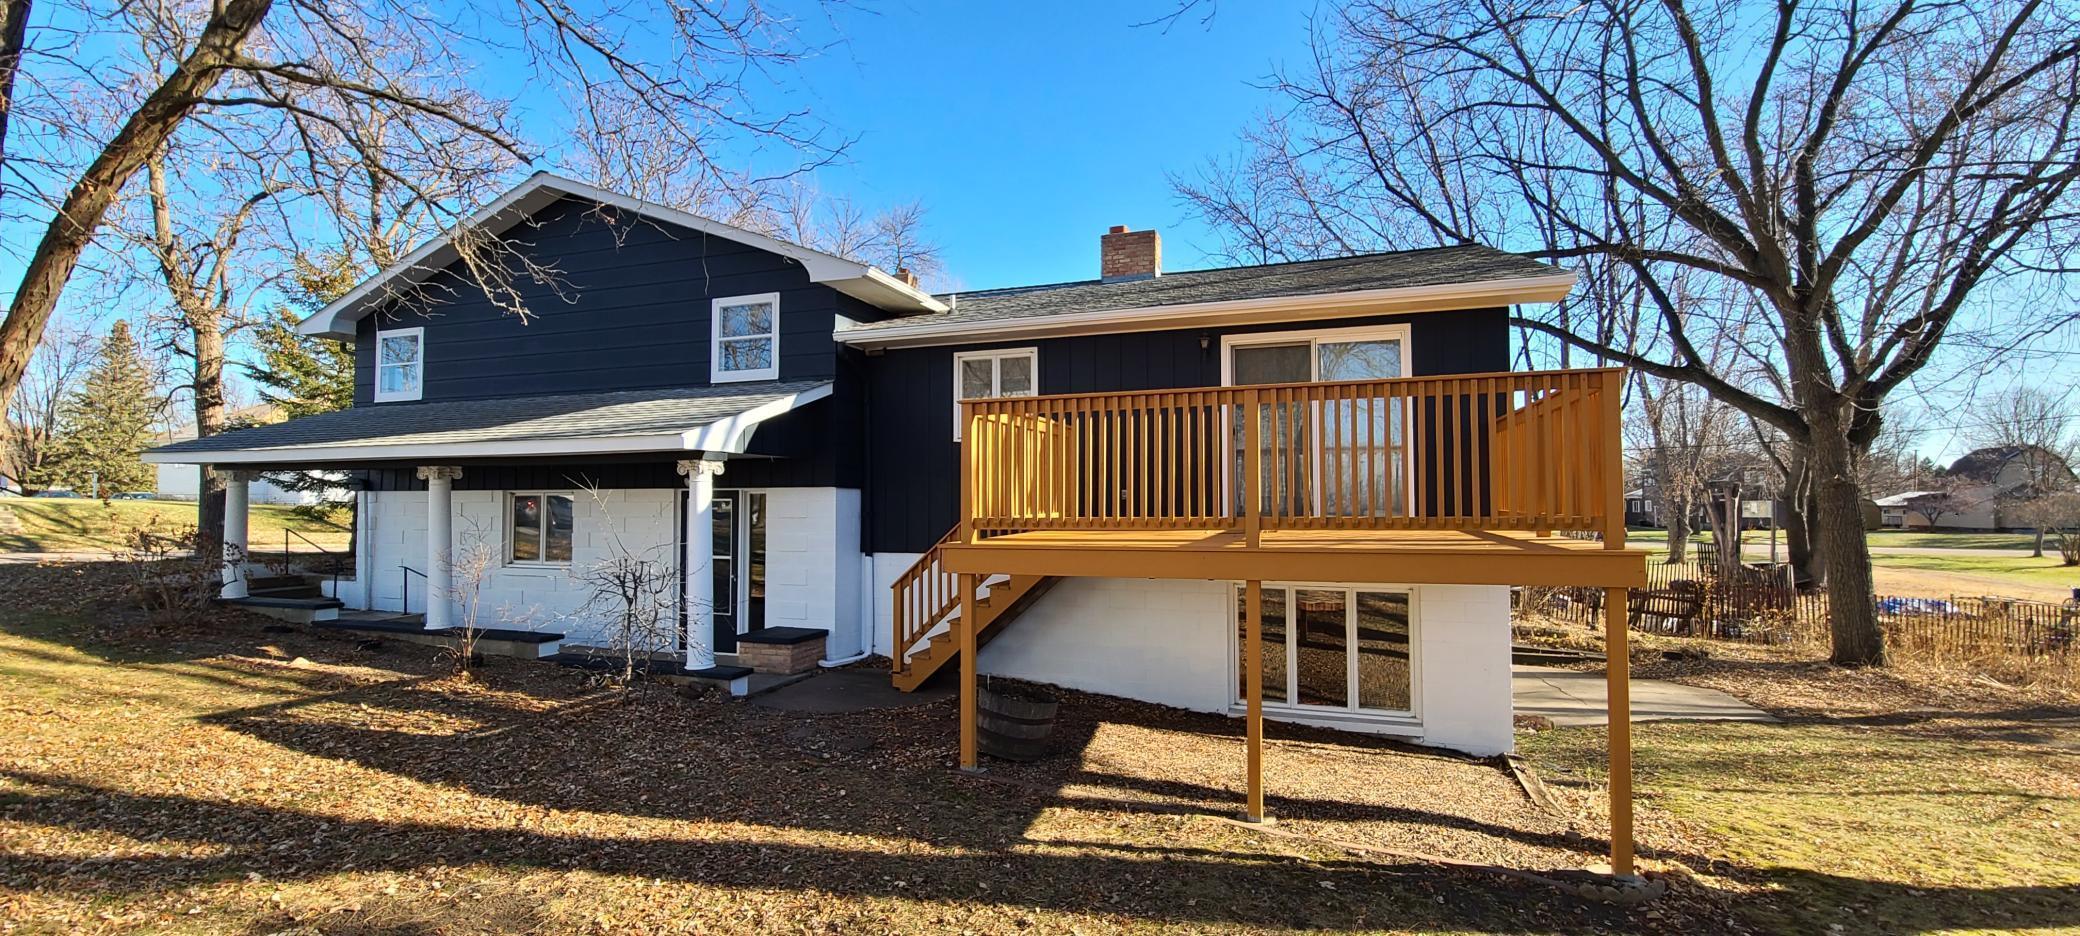 340 W Winona Street Property Photo - Sanborn, MN real estate listing